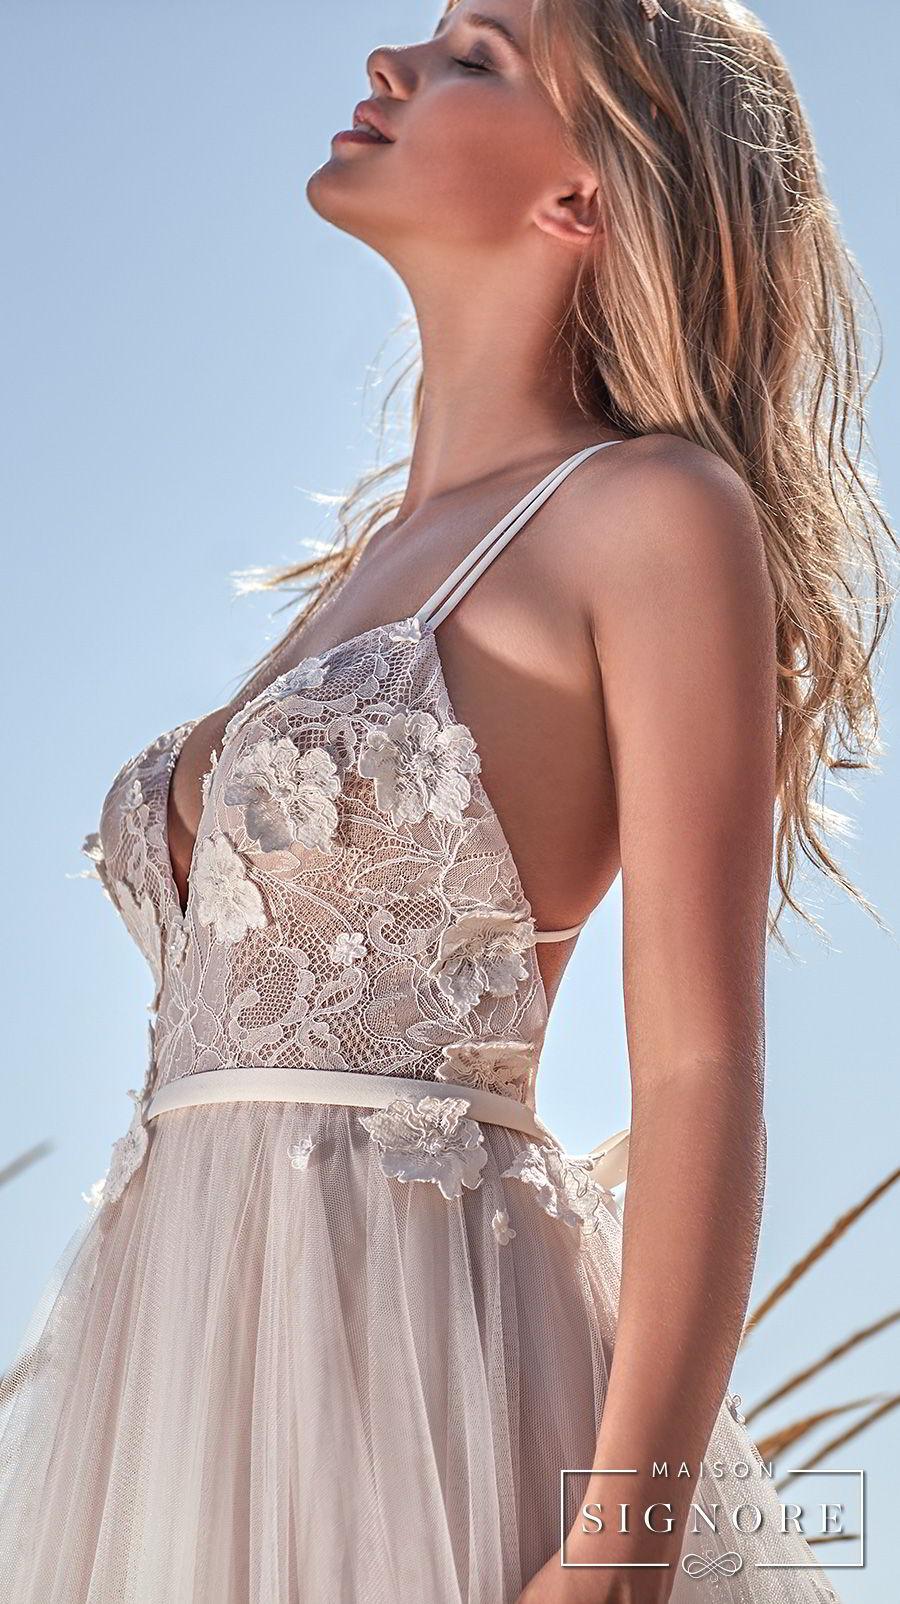 maison signore 2018 bridal thin strap sweetheart neckline heavily embellished bodice tulle skirt romantic a line wedding dress chapel train (caroline) zsdv